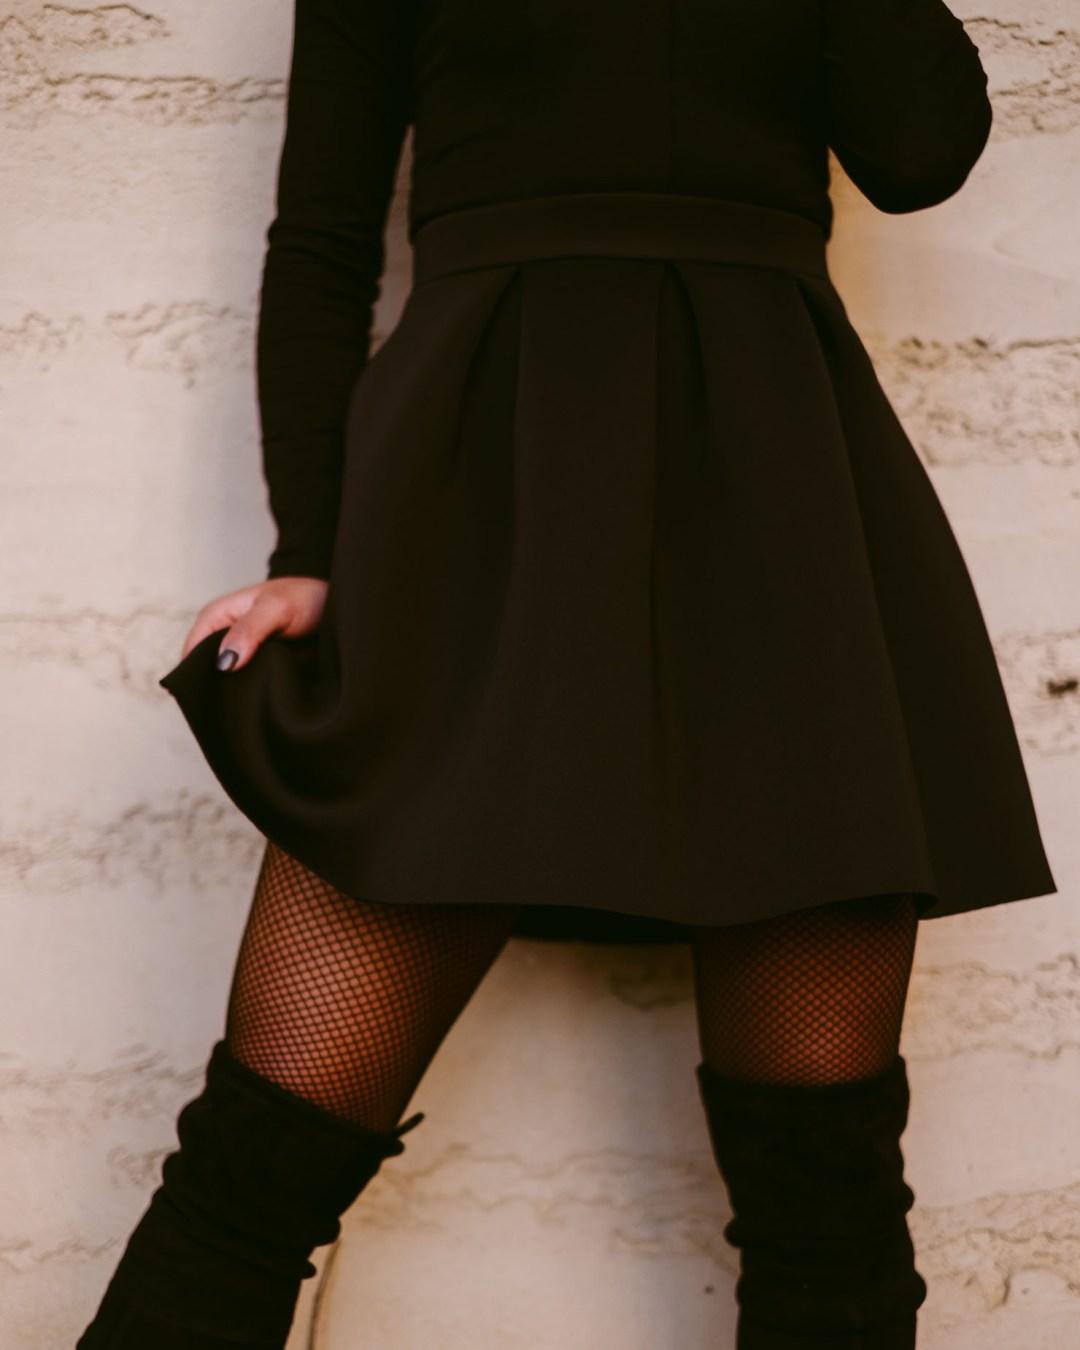 Lifestyle blogger Kelsey Kaplan of Kelsey Kaplan Fashion wearing fox mask and fishnet stockings to costume party